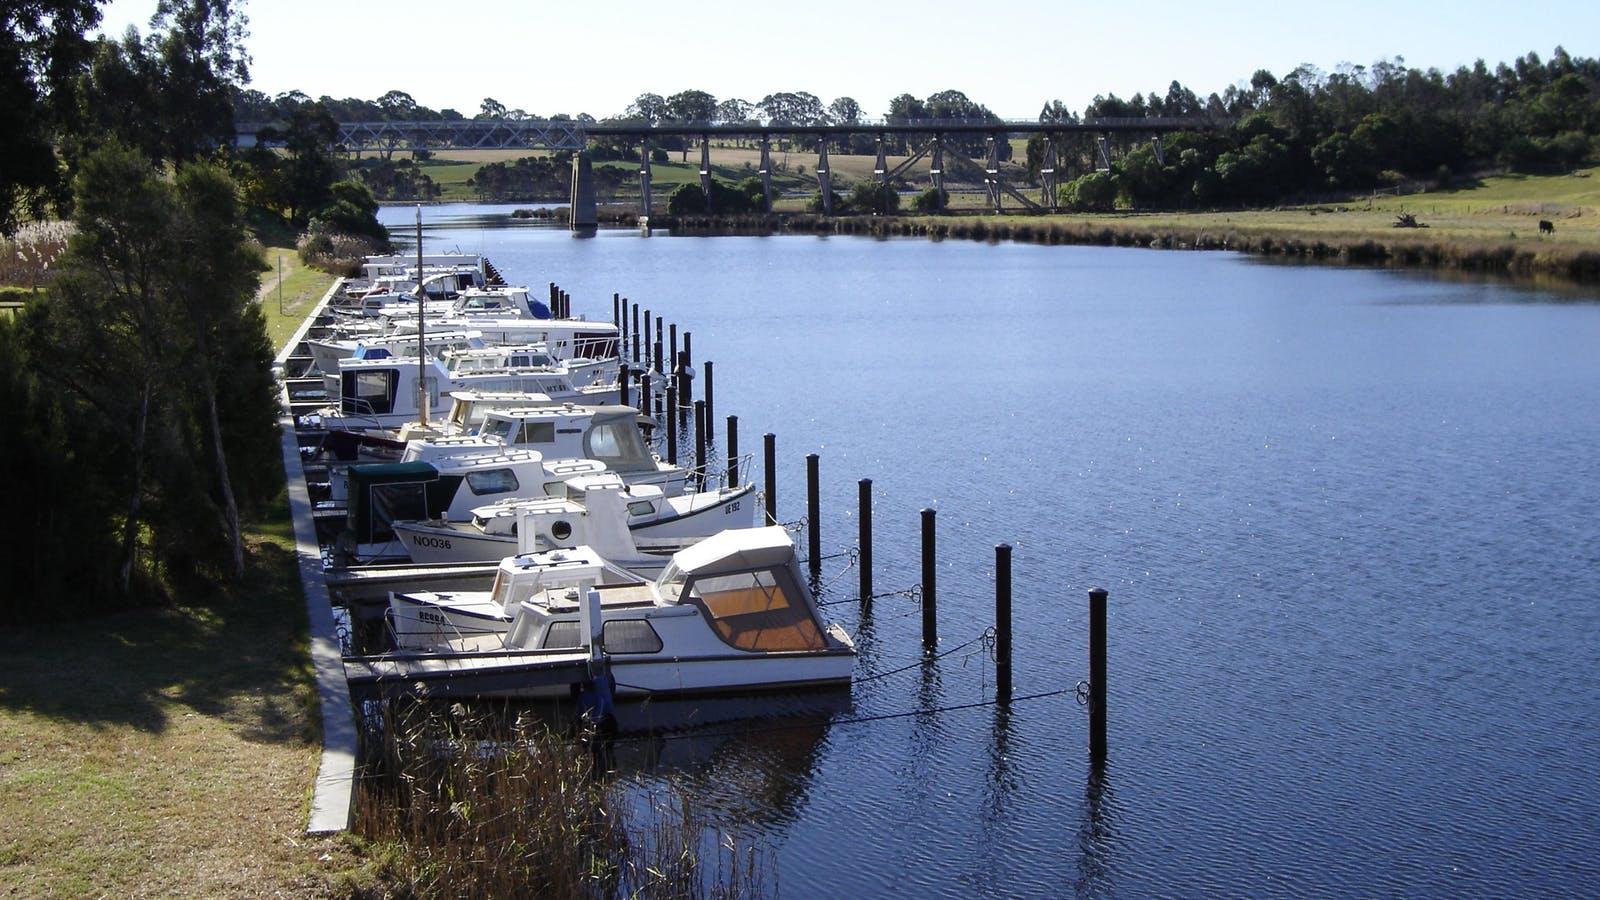 Boat moorings on the Nicholson River